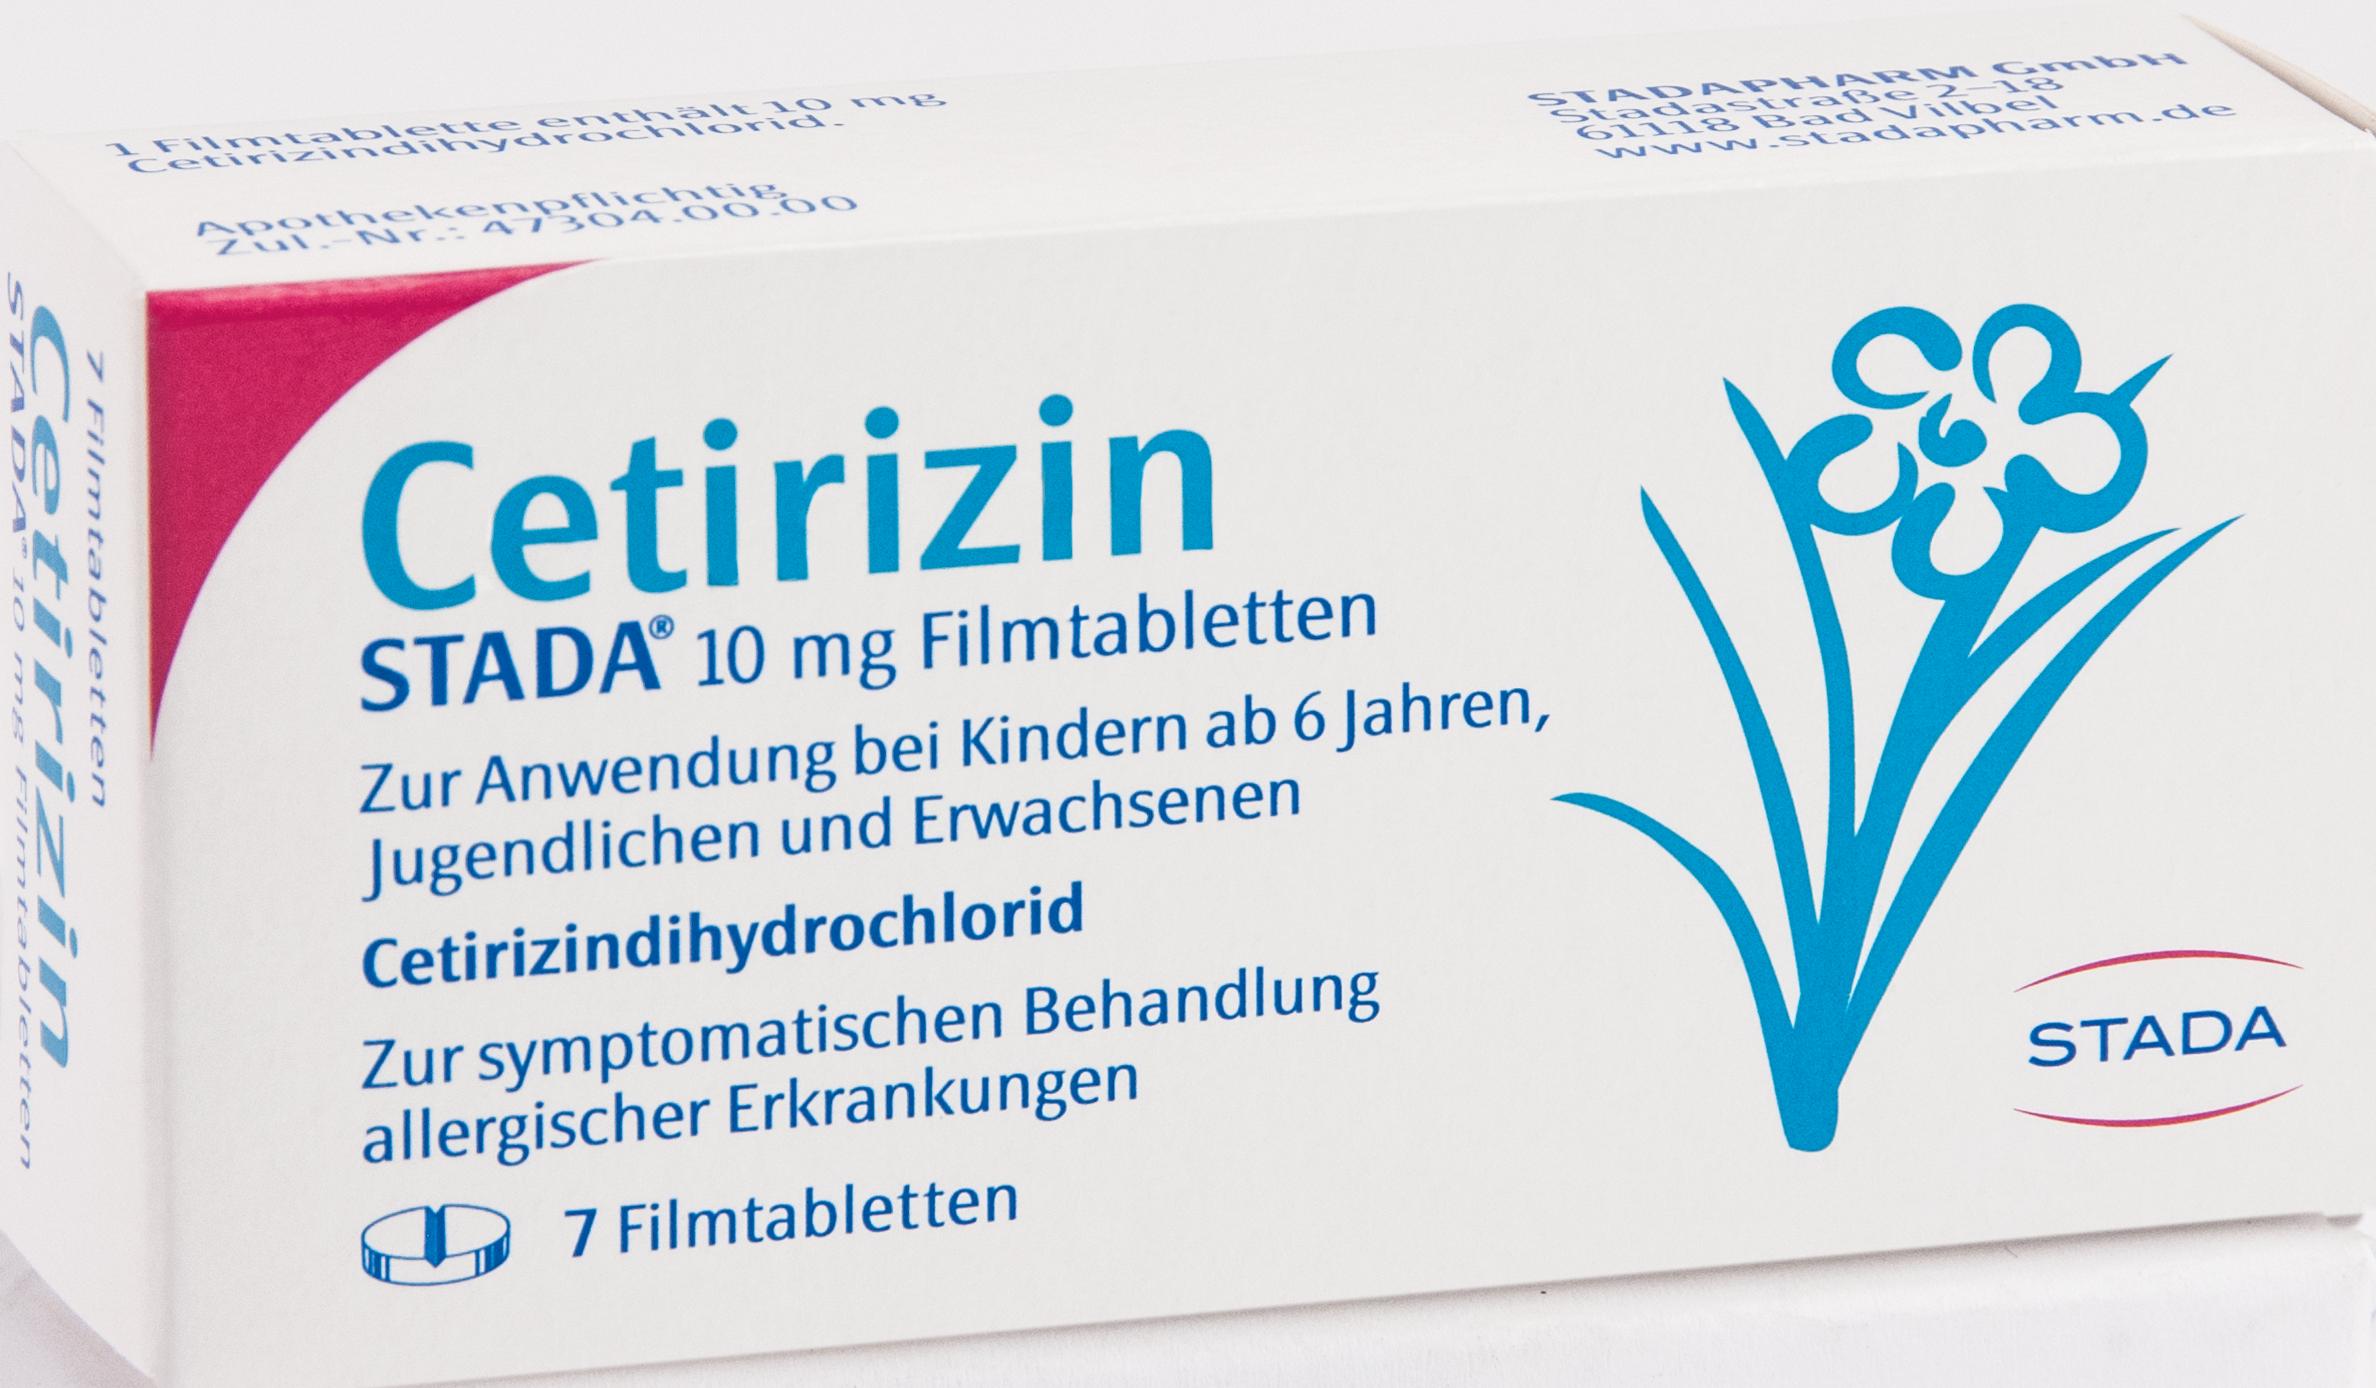 Cetirizin STADA 10mg Filmtabletten